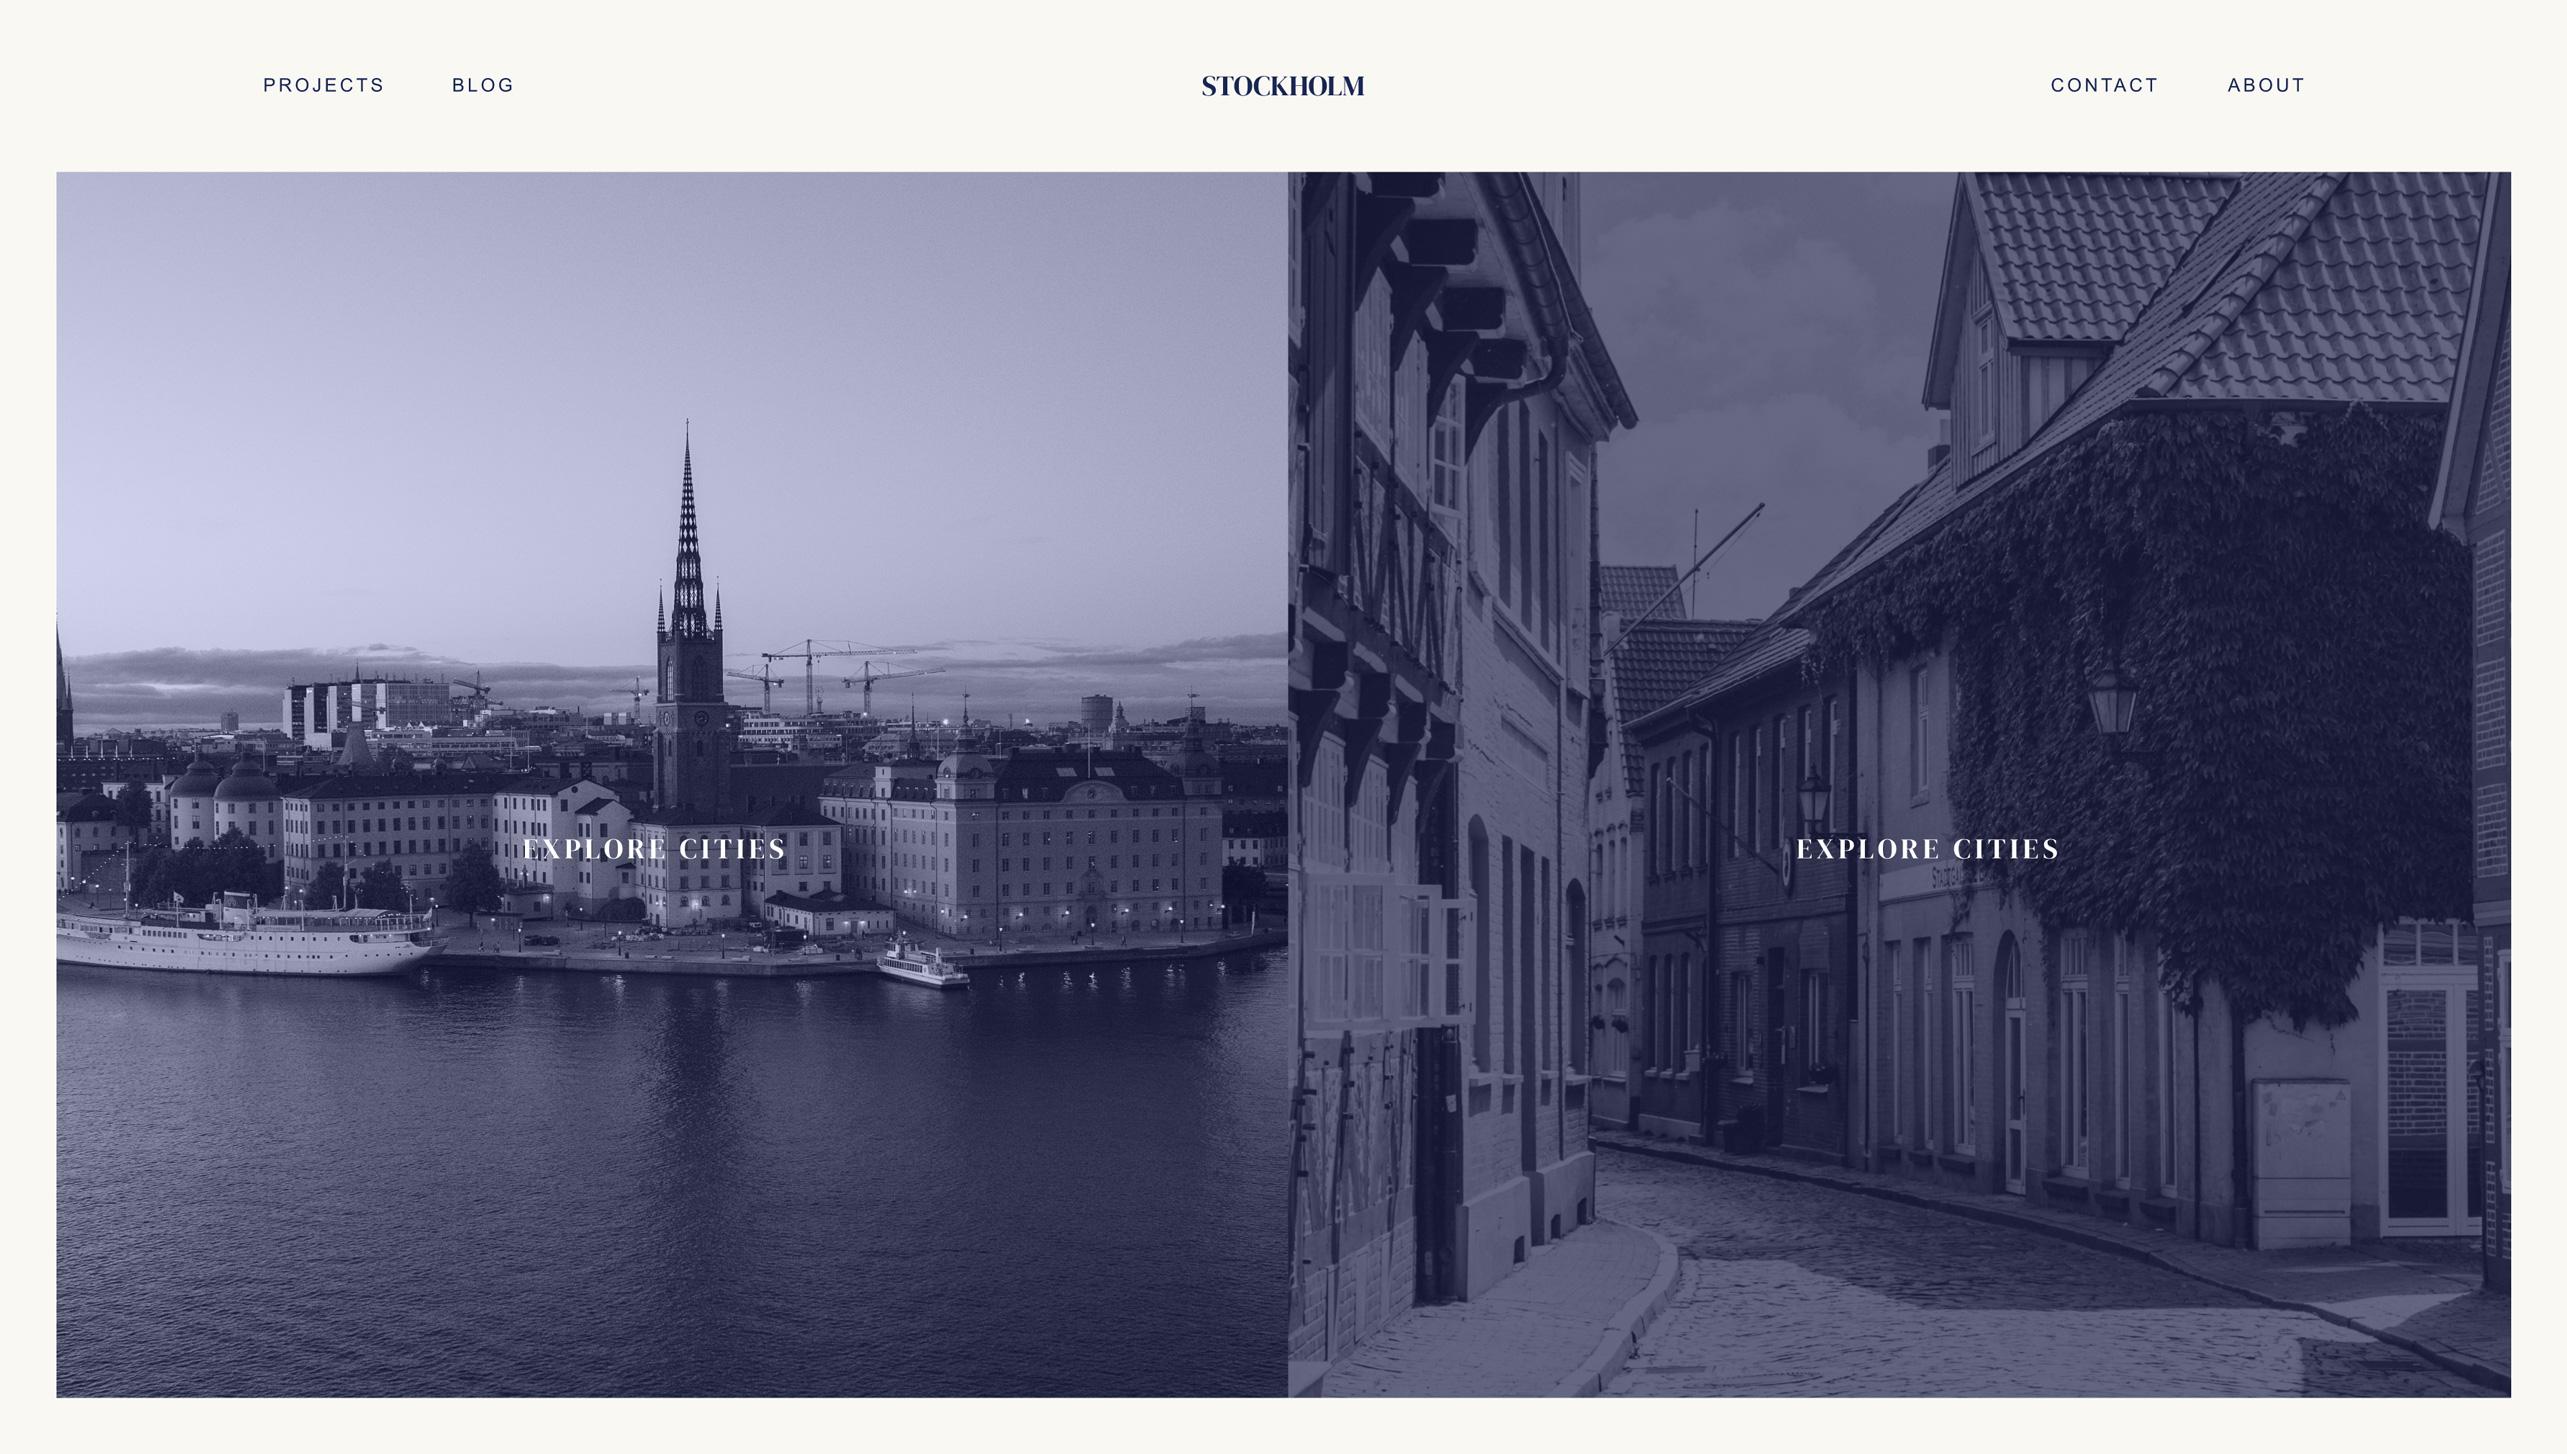 Picture of Stockholm website